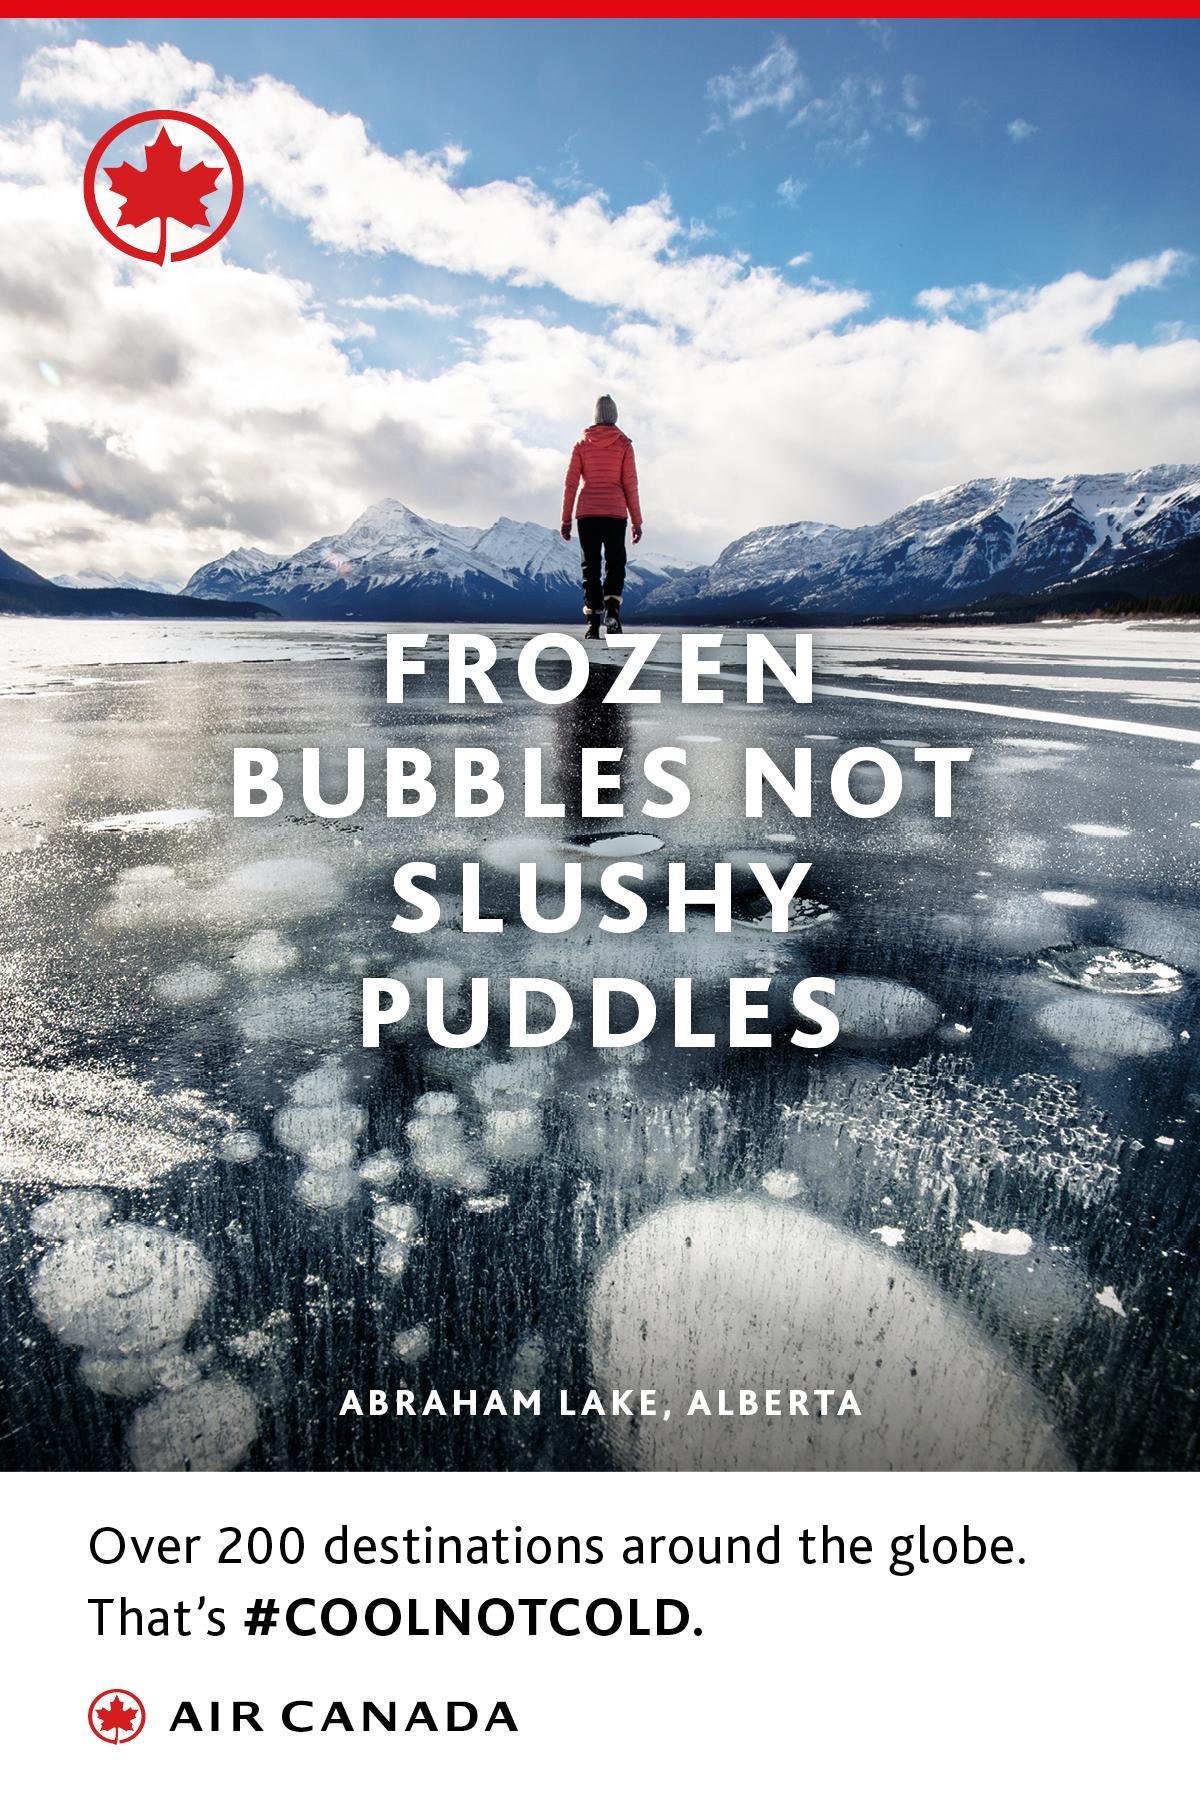 Air Canada Outdoor Ad - Frozen